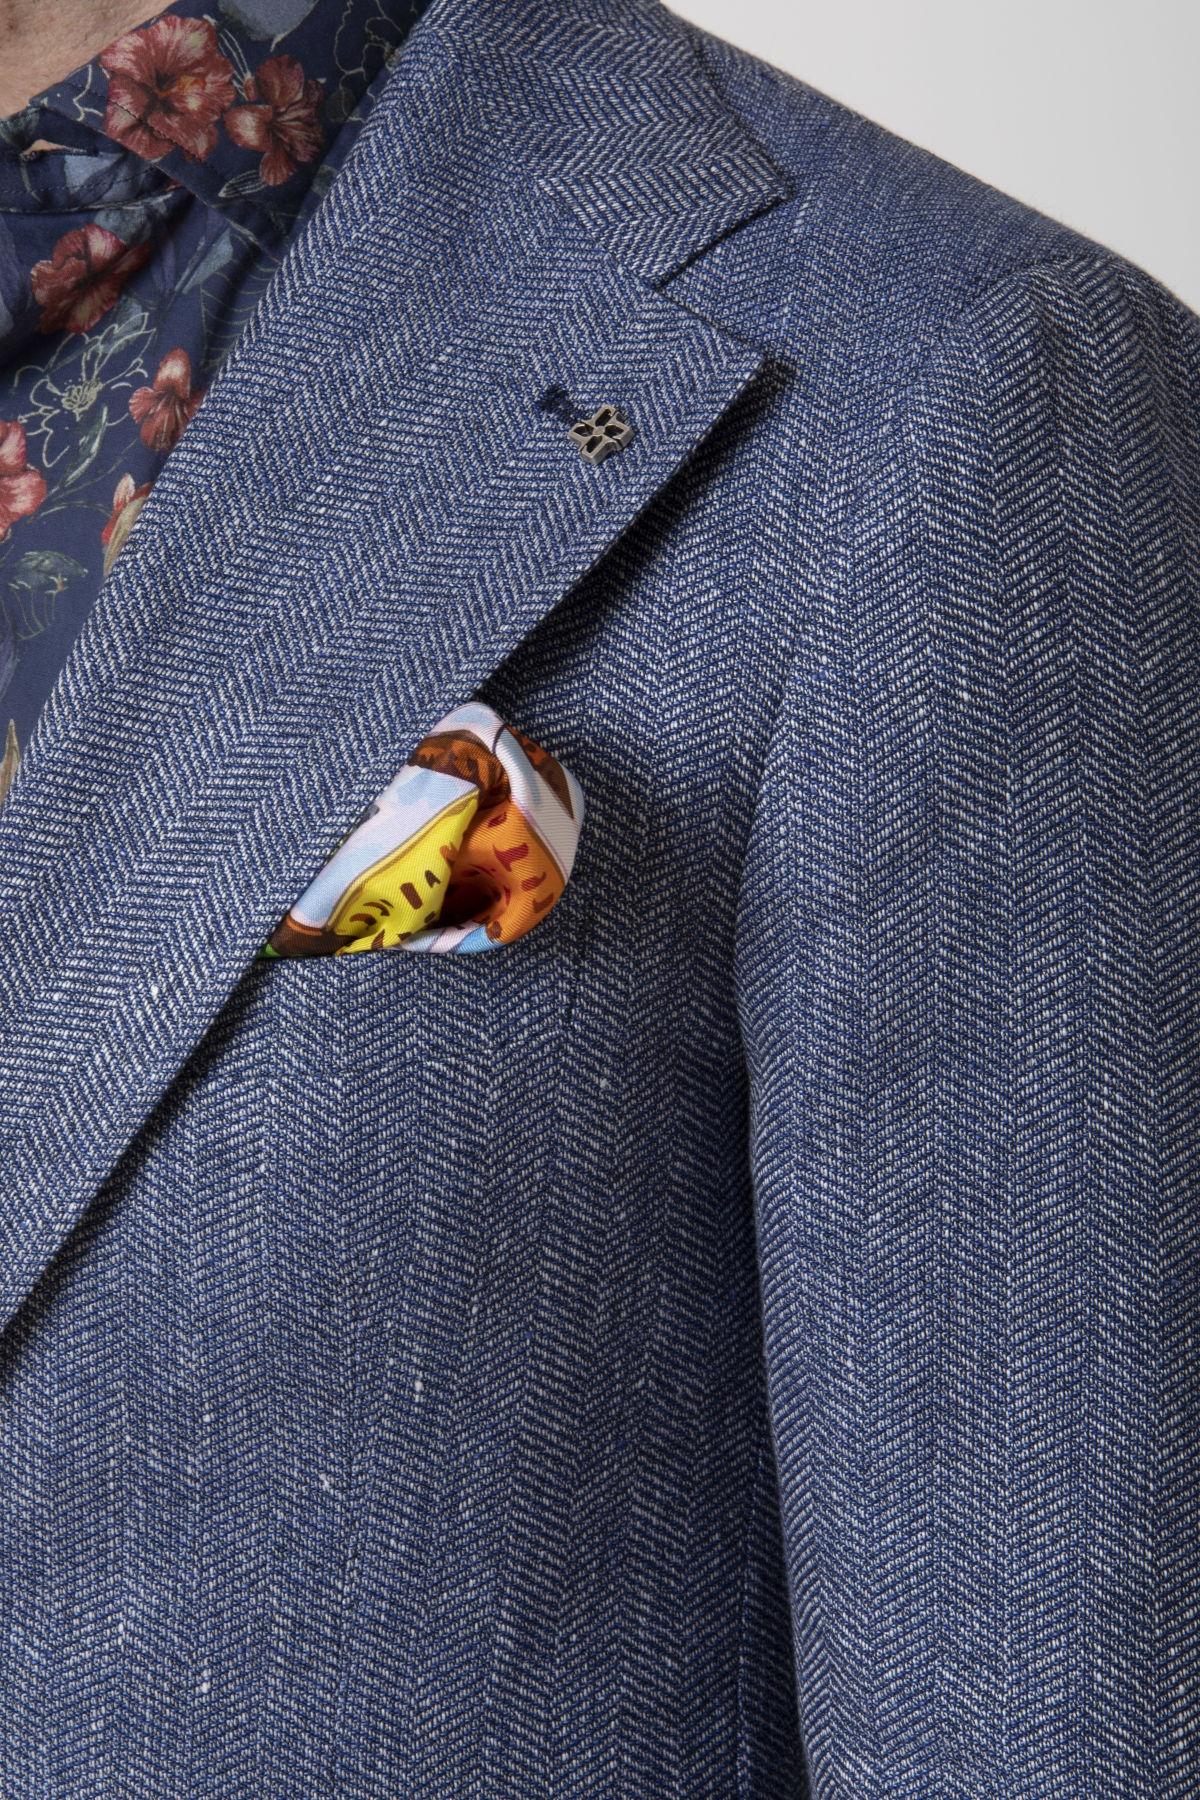 Jacket for man PINO LERARIO BY TAGLIATORE S/S 19